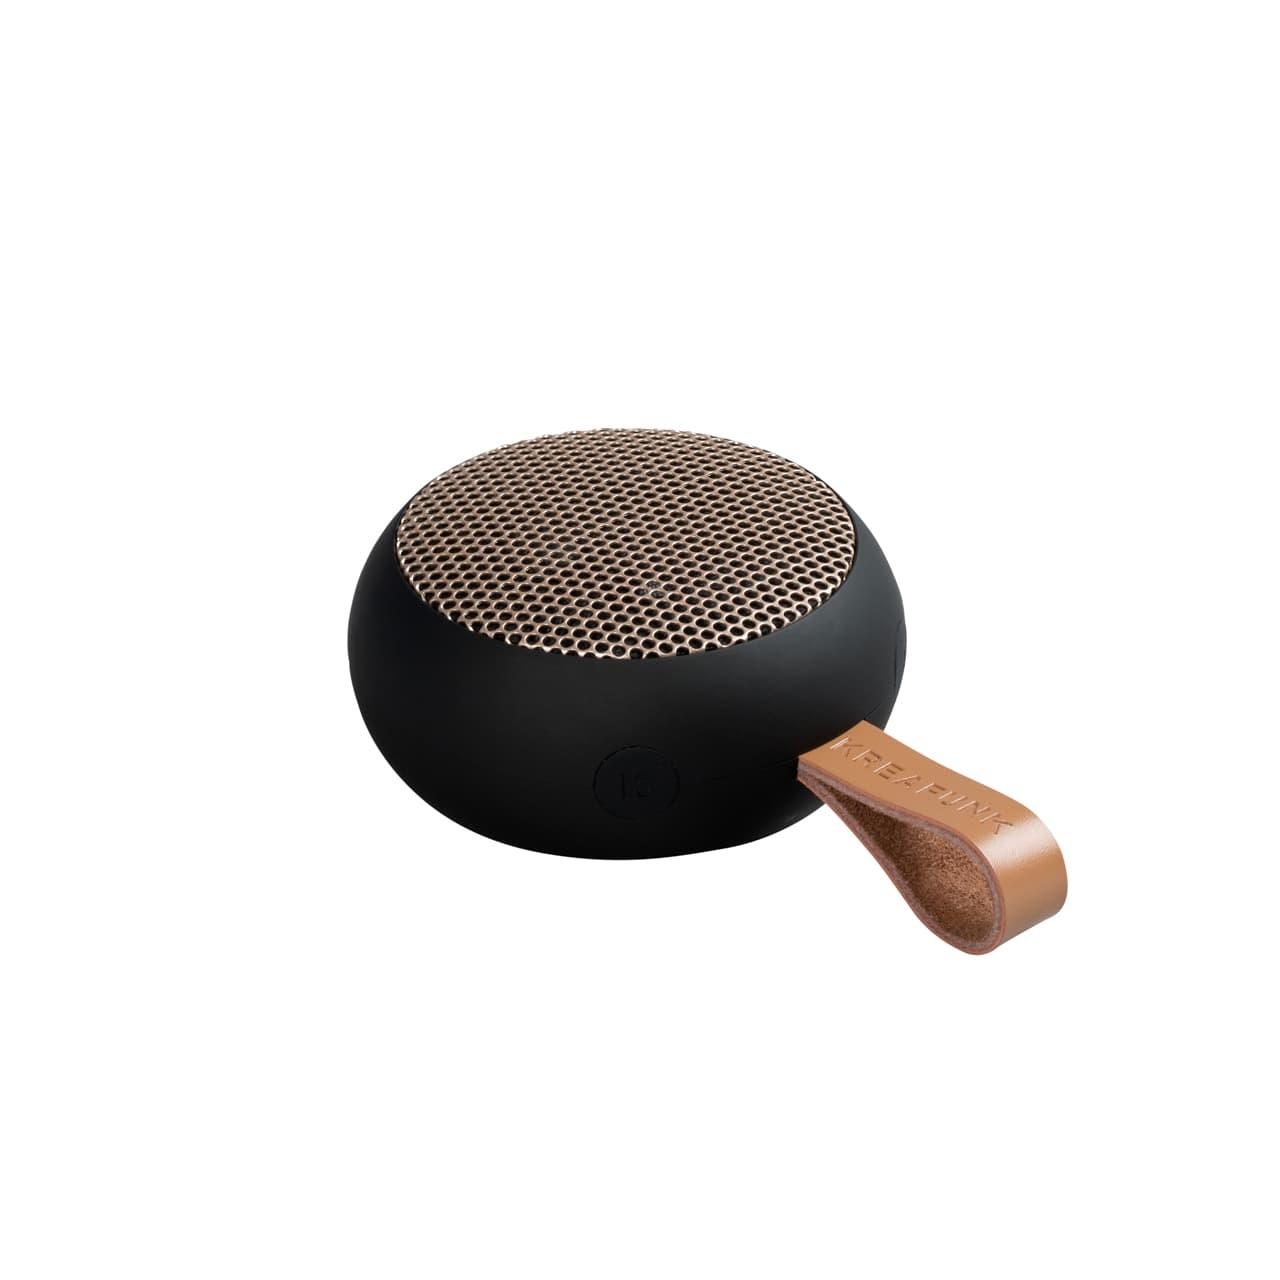 Kreafunk Kreafunk aGo bluetooth speaker Black - Gold